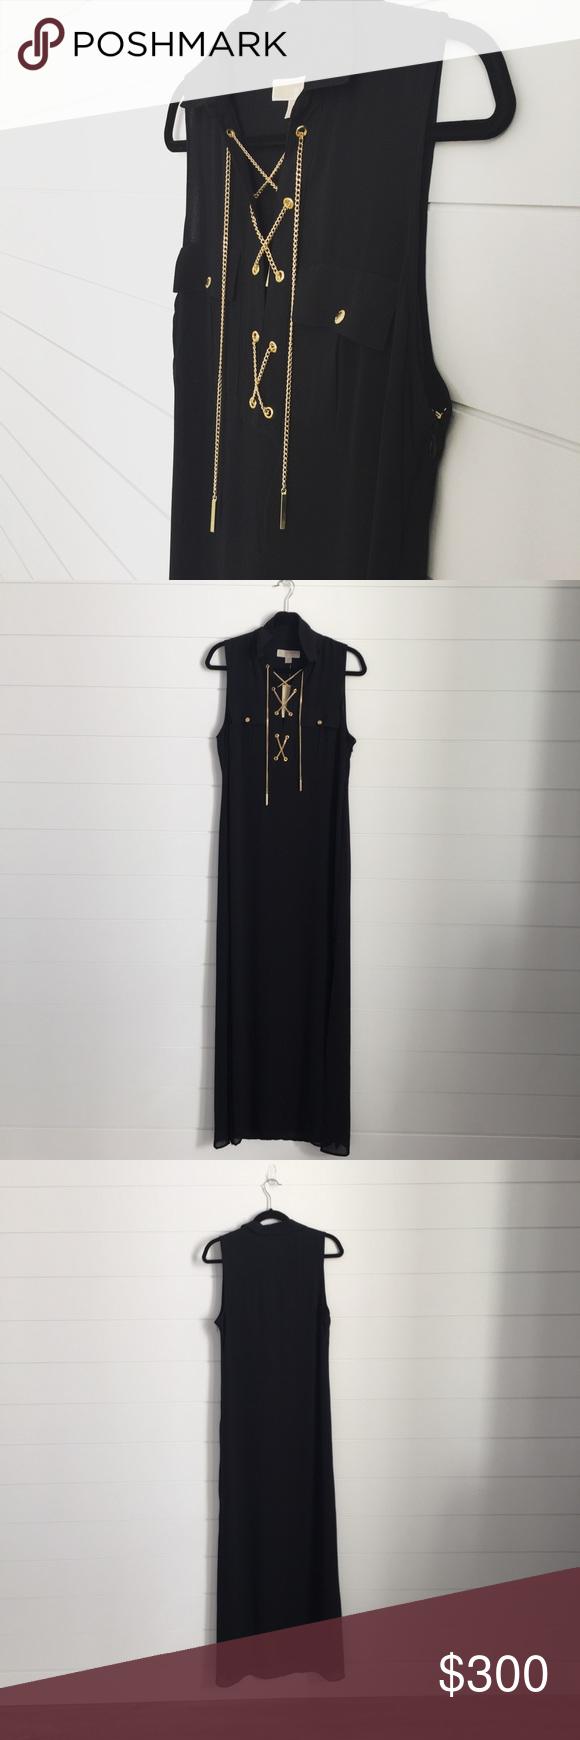 Limited Michael Kors Maxi Dress Gold Chain Lace Up Black Maxi Dress Gold Dress Michael Kors Dresses [ 1740 x 580 Pixel ]